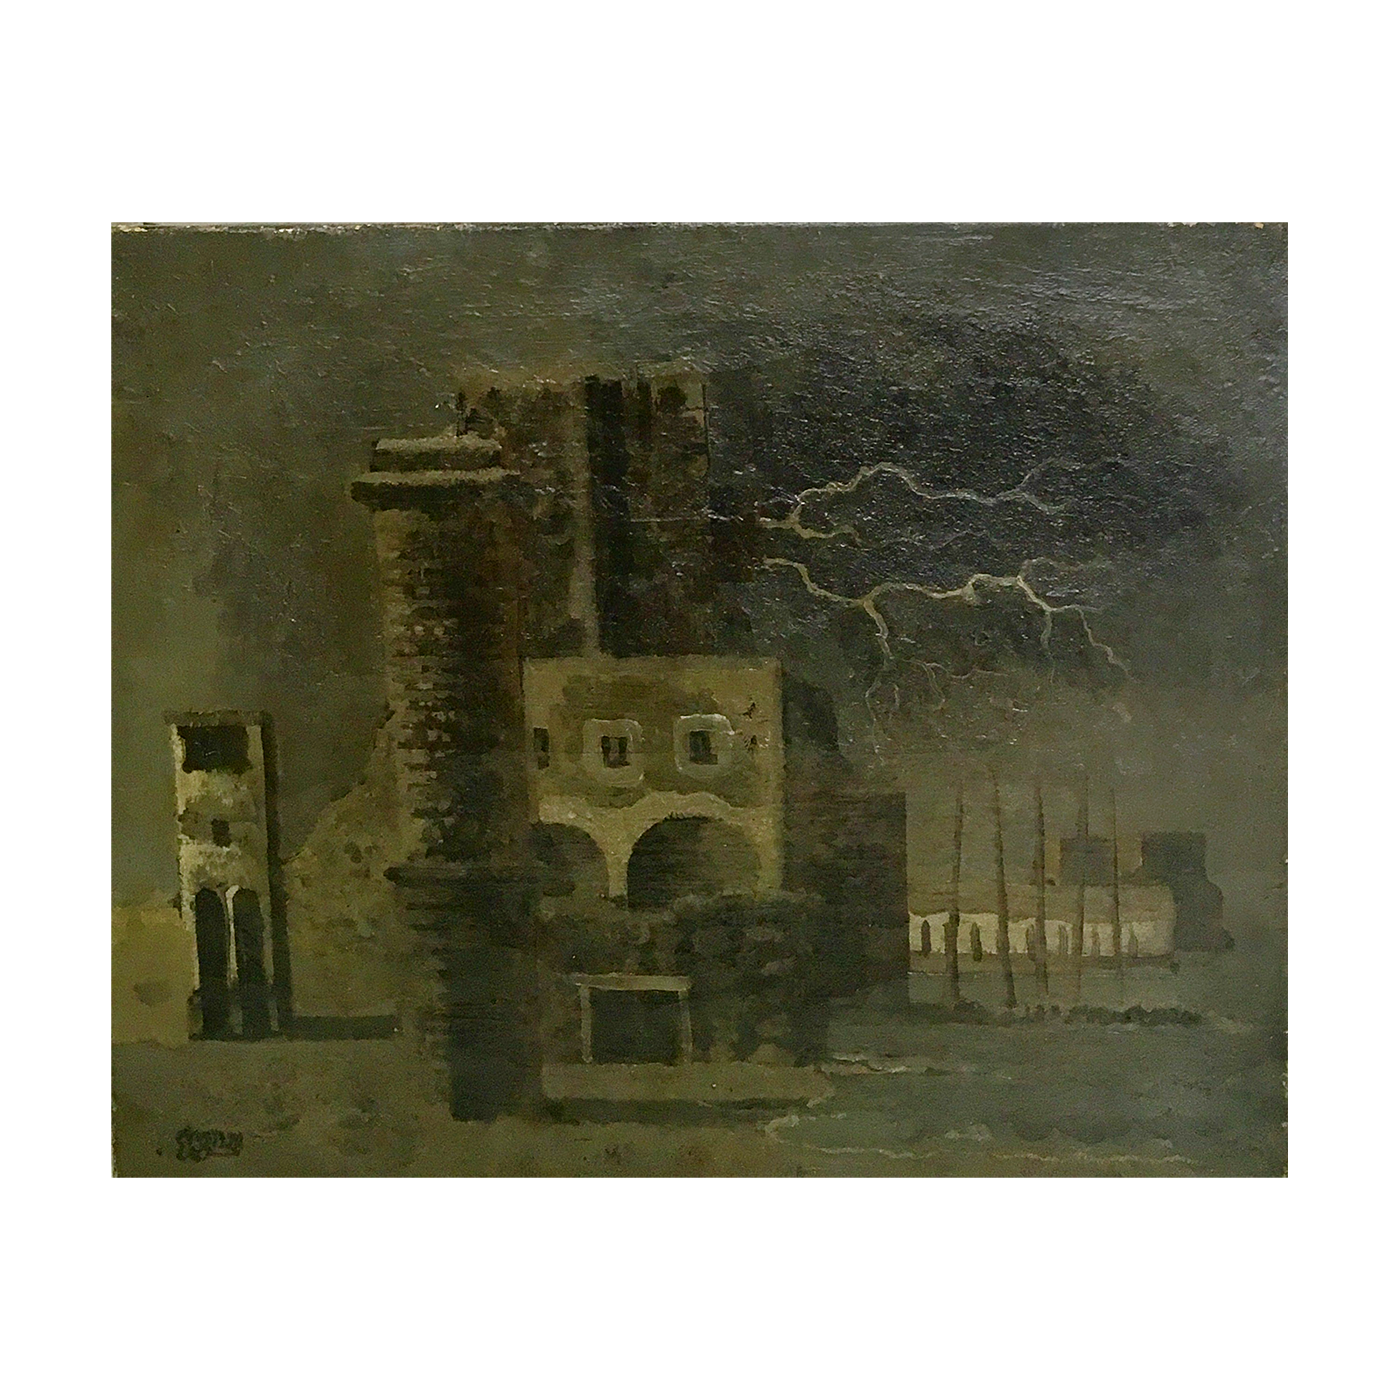 Eugene Gustavovitch Berman [1899-1972], American/Russian Surrealistic Painter, Cityscape, Les sous l'orage, The Storm, 1928